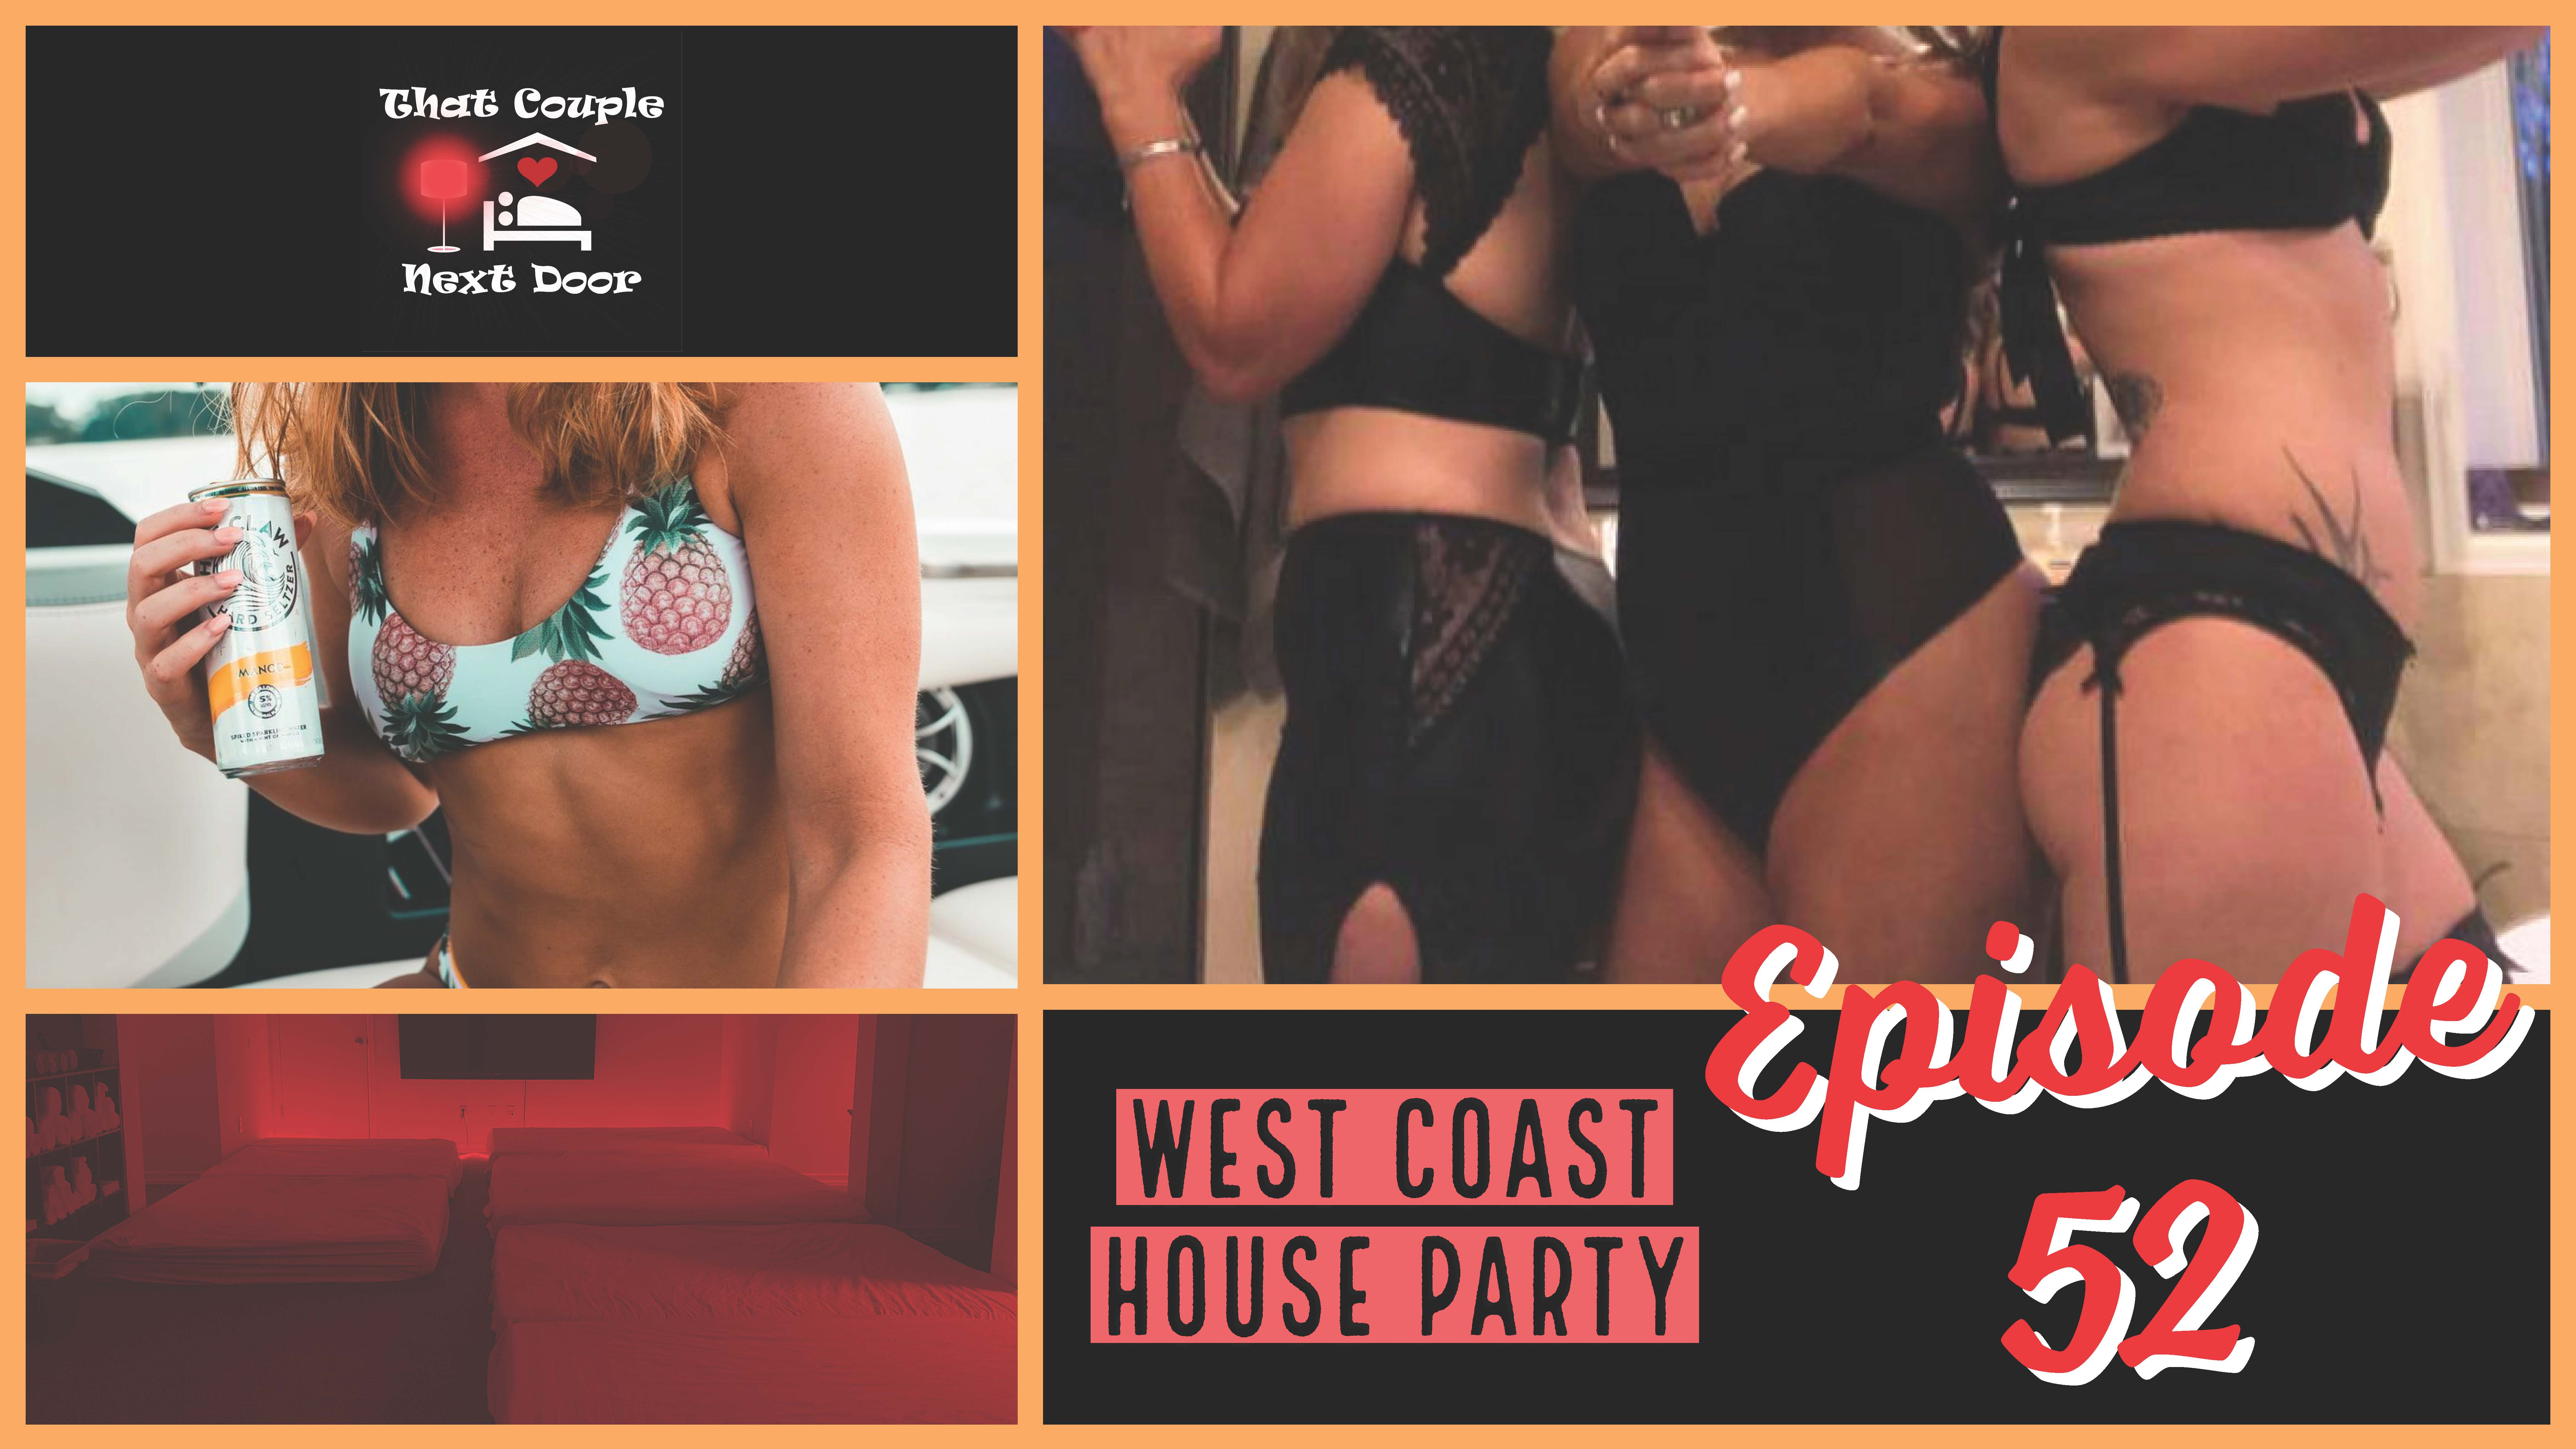 Episode 52 - West Coast House Party